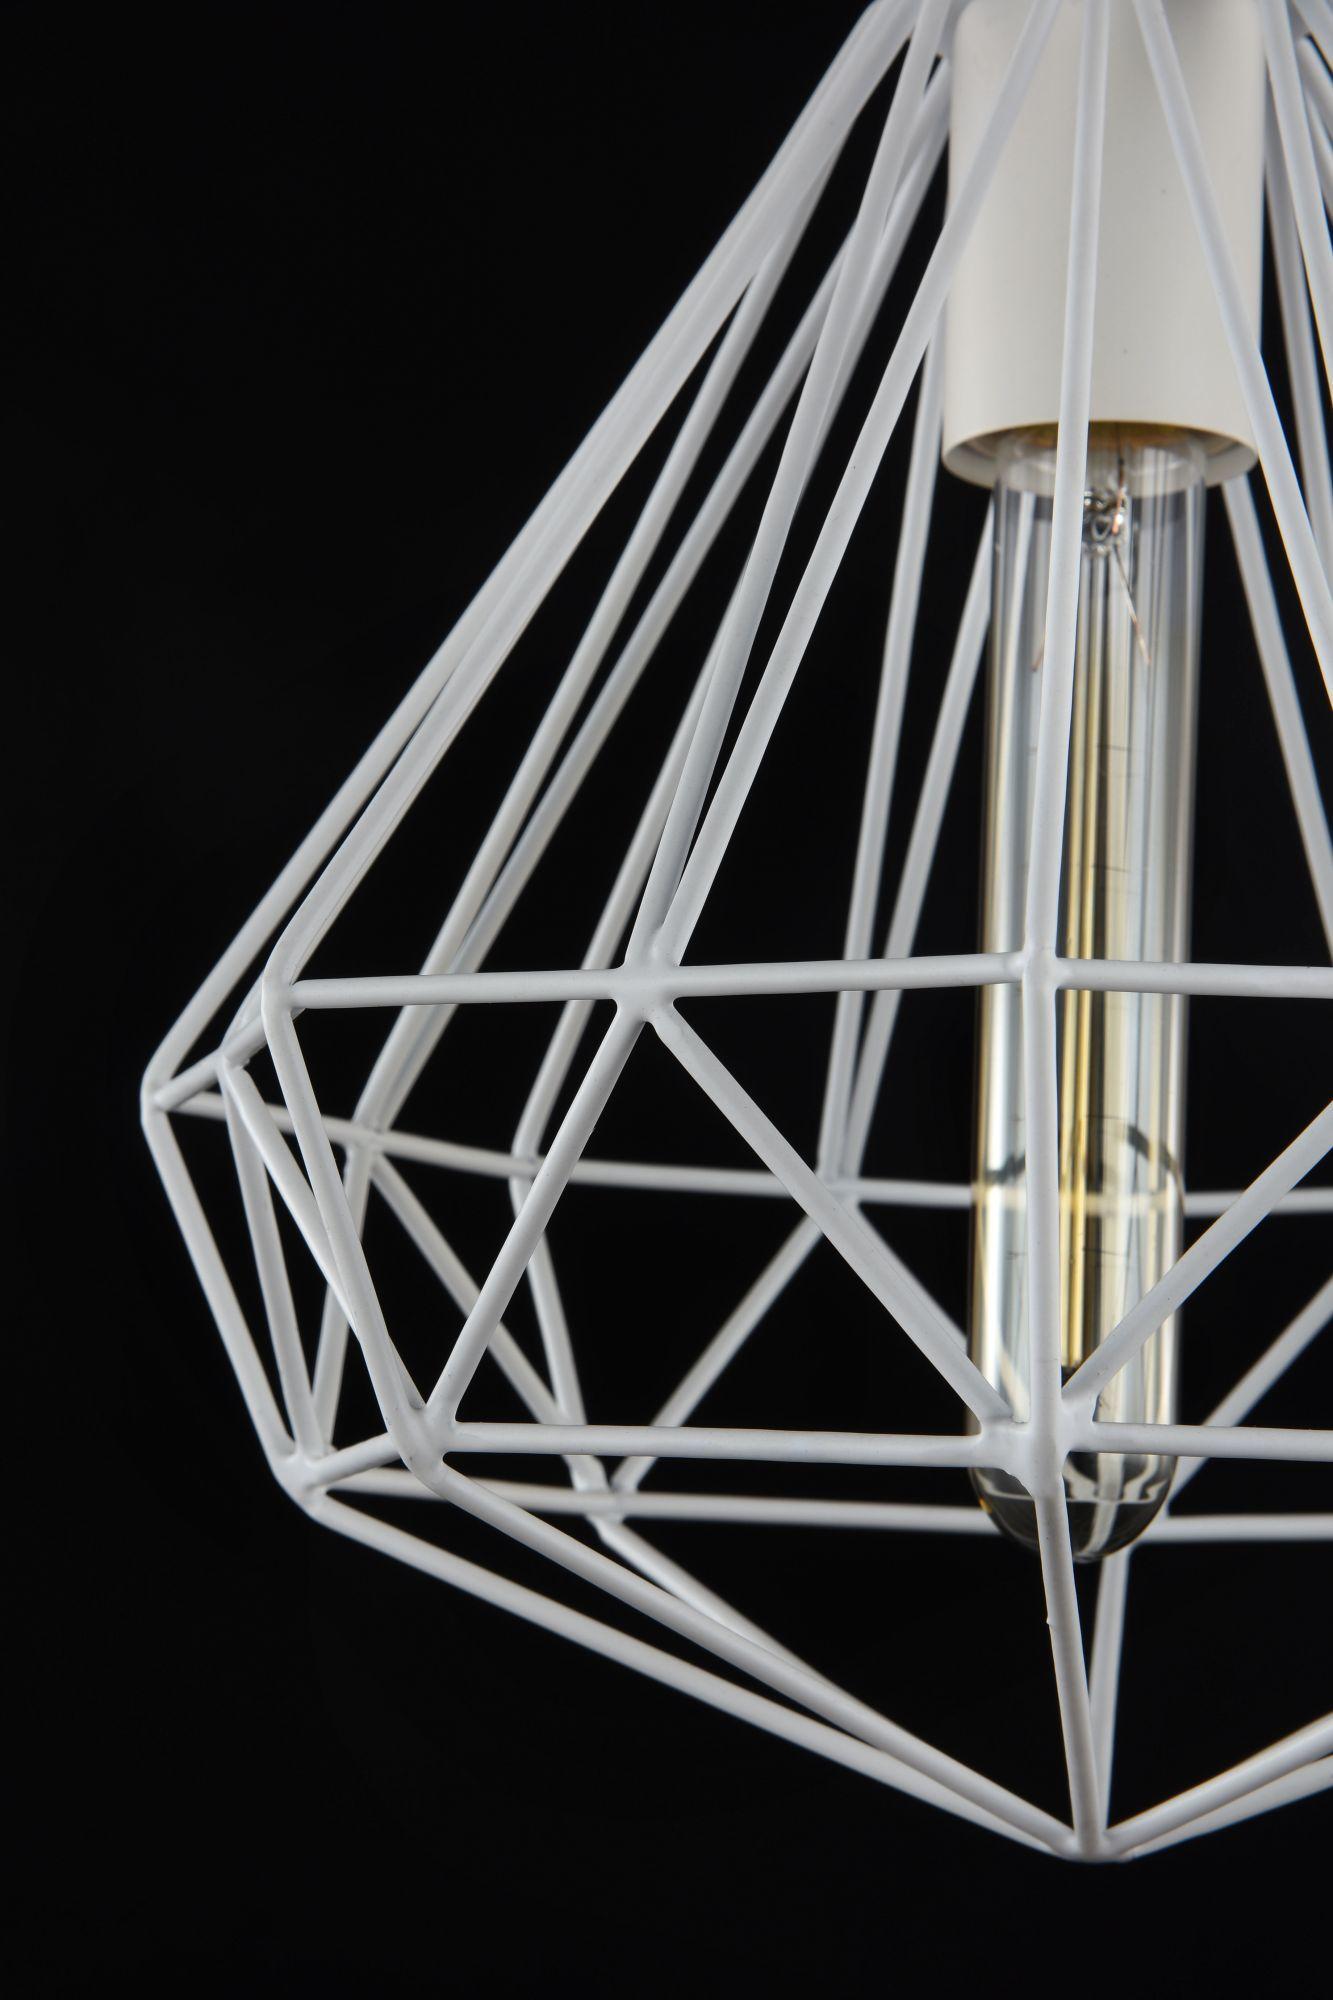 Подвесной светильник Maytoni Loft Calaf P360-PL-250-W (MOD360-01-W), 1xE27x60W, белый, металл - фото 5